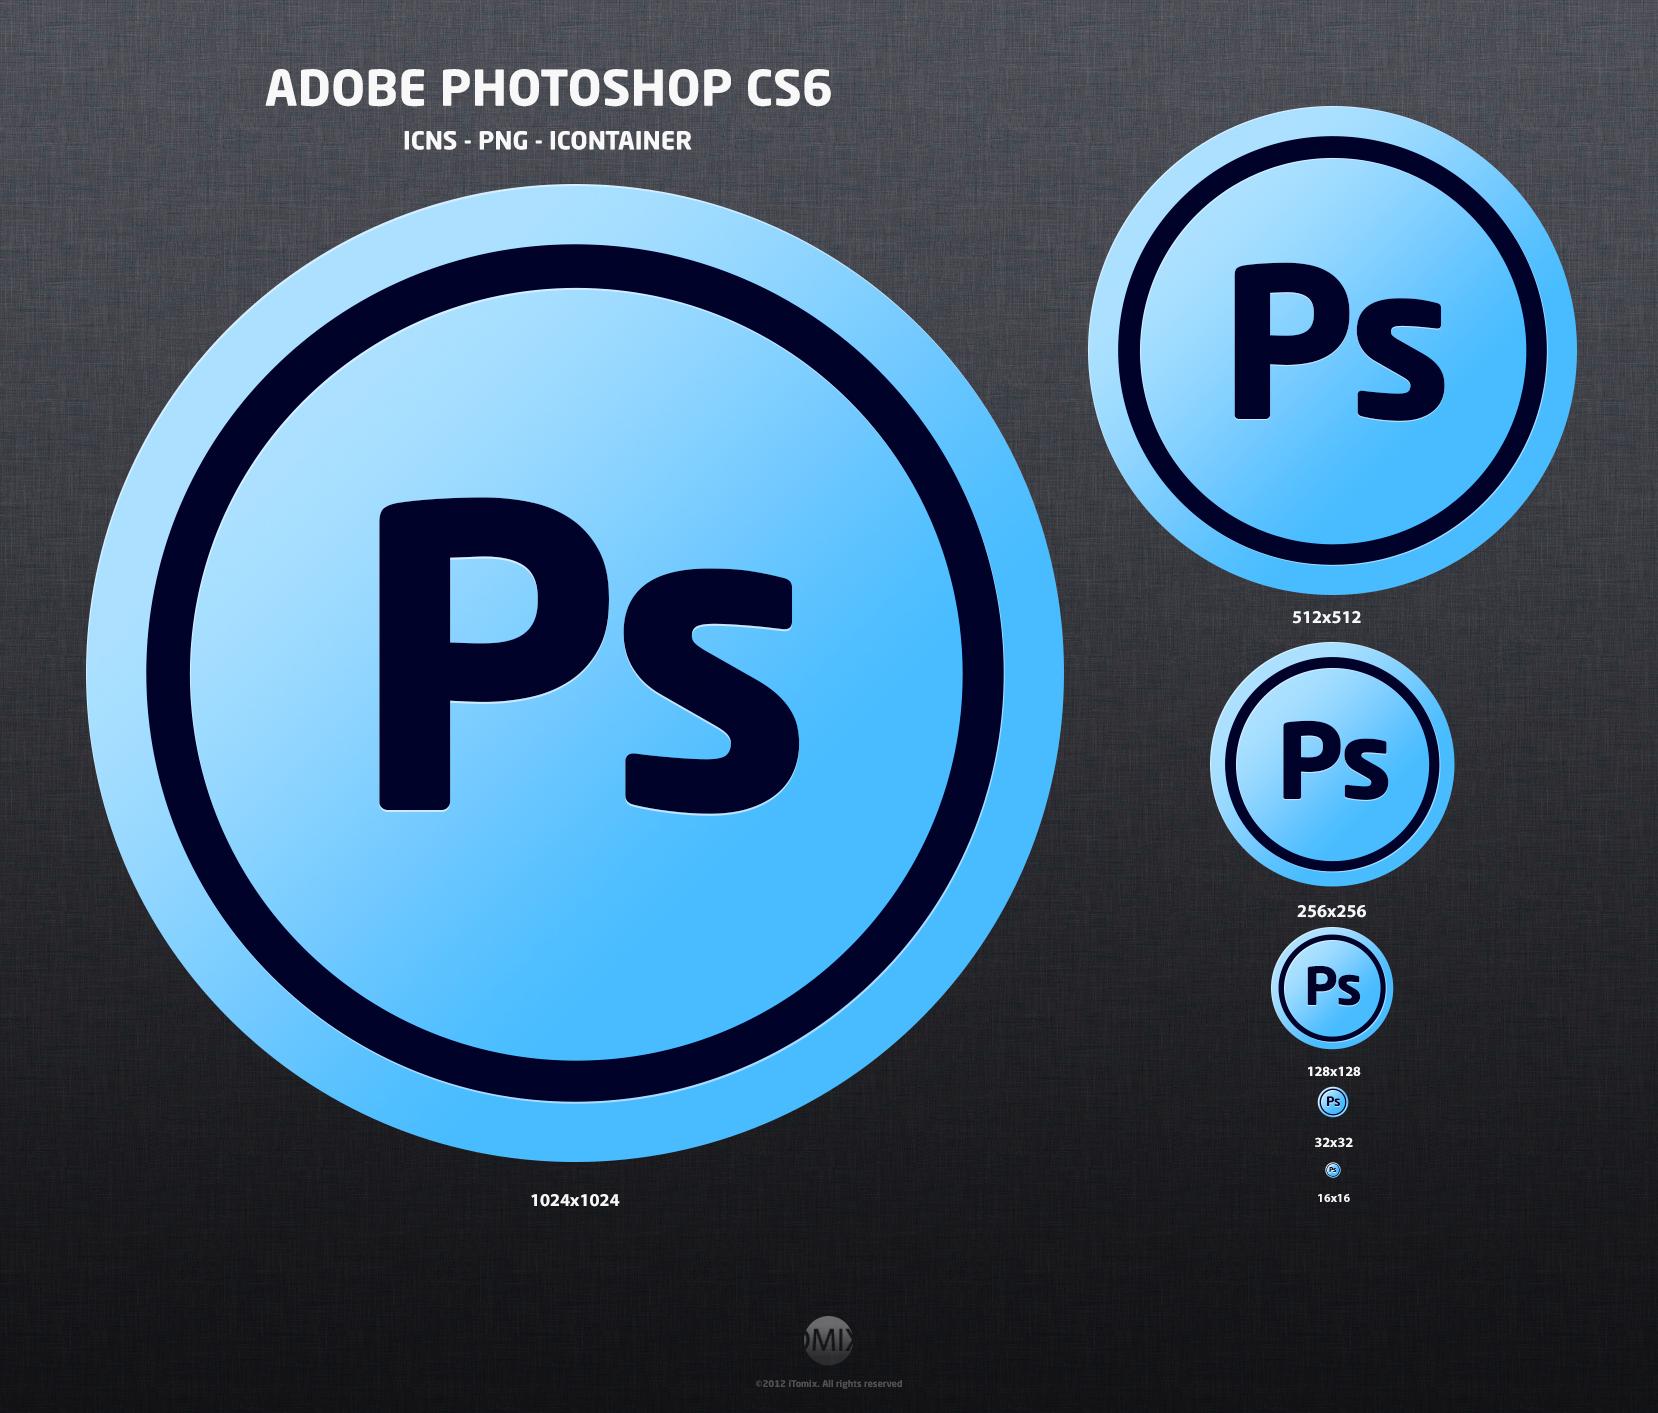 Adobe photoshop cs6 icon by itomix